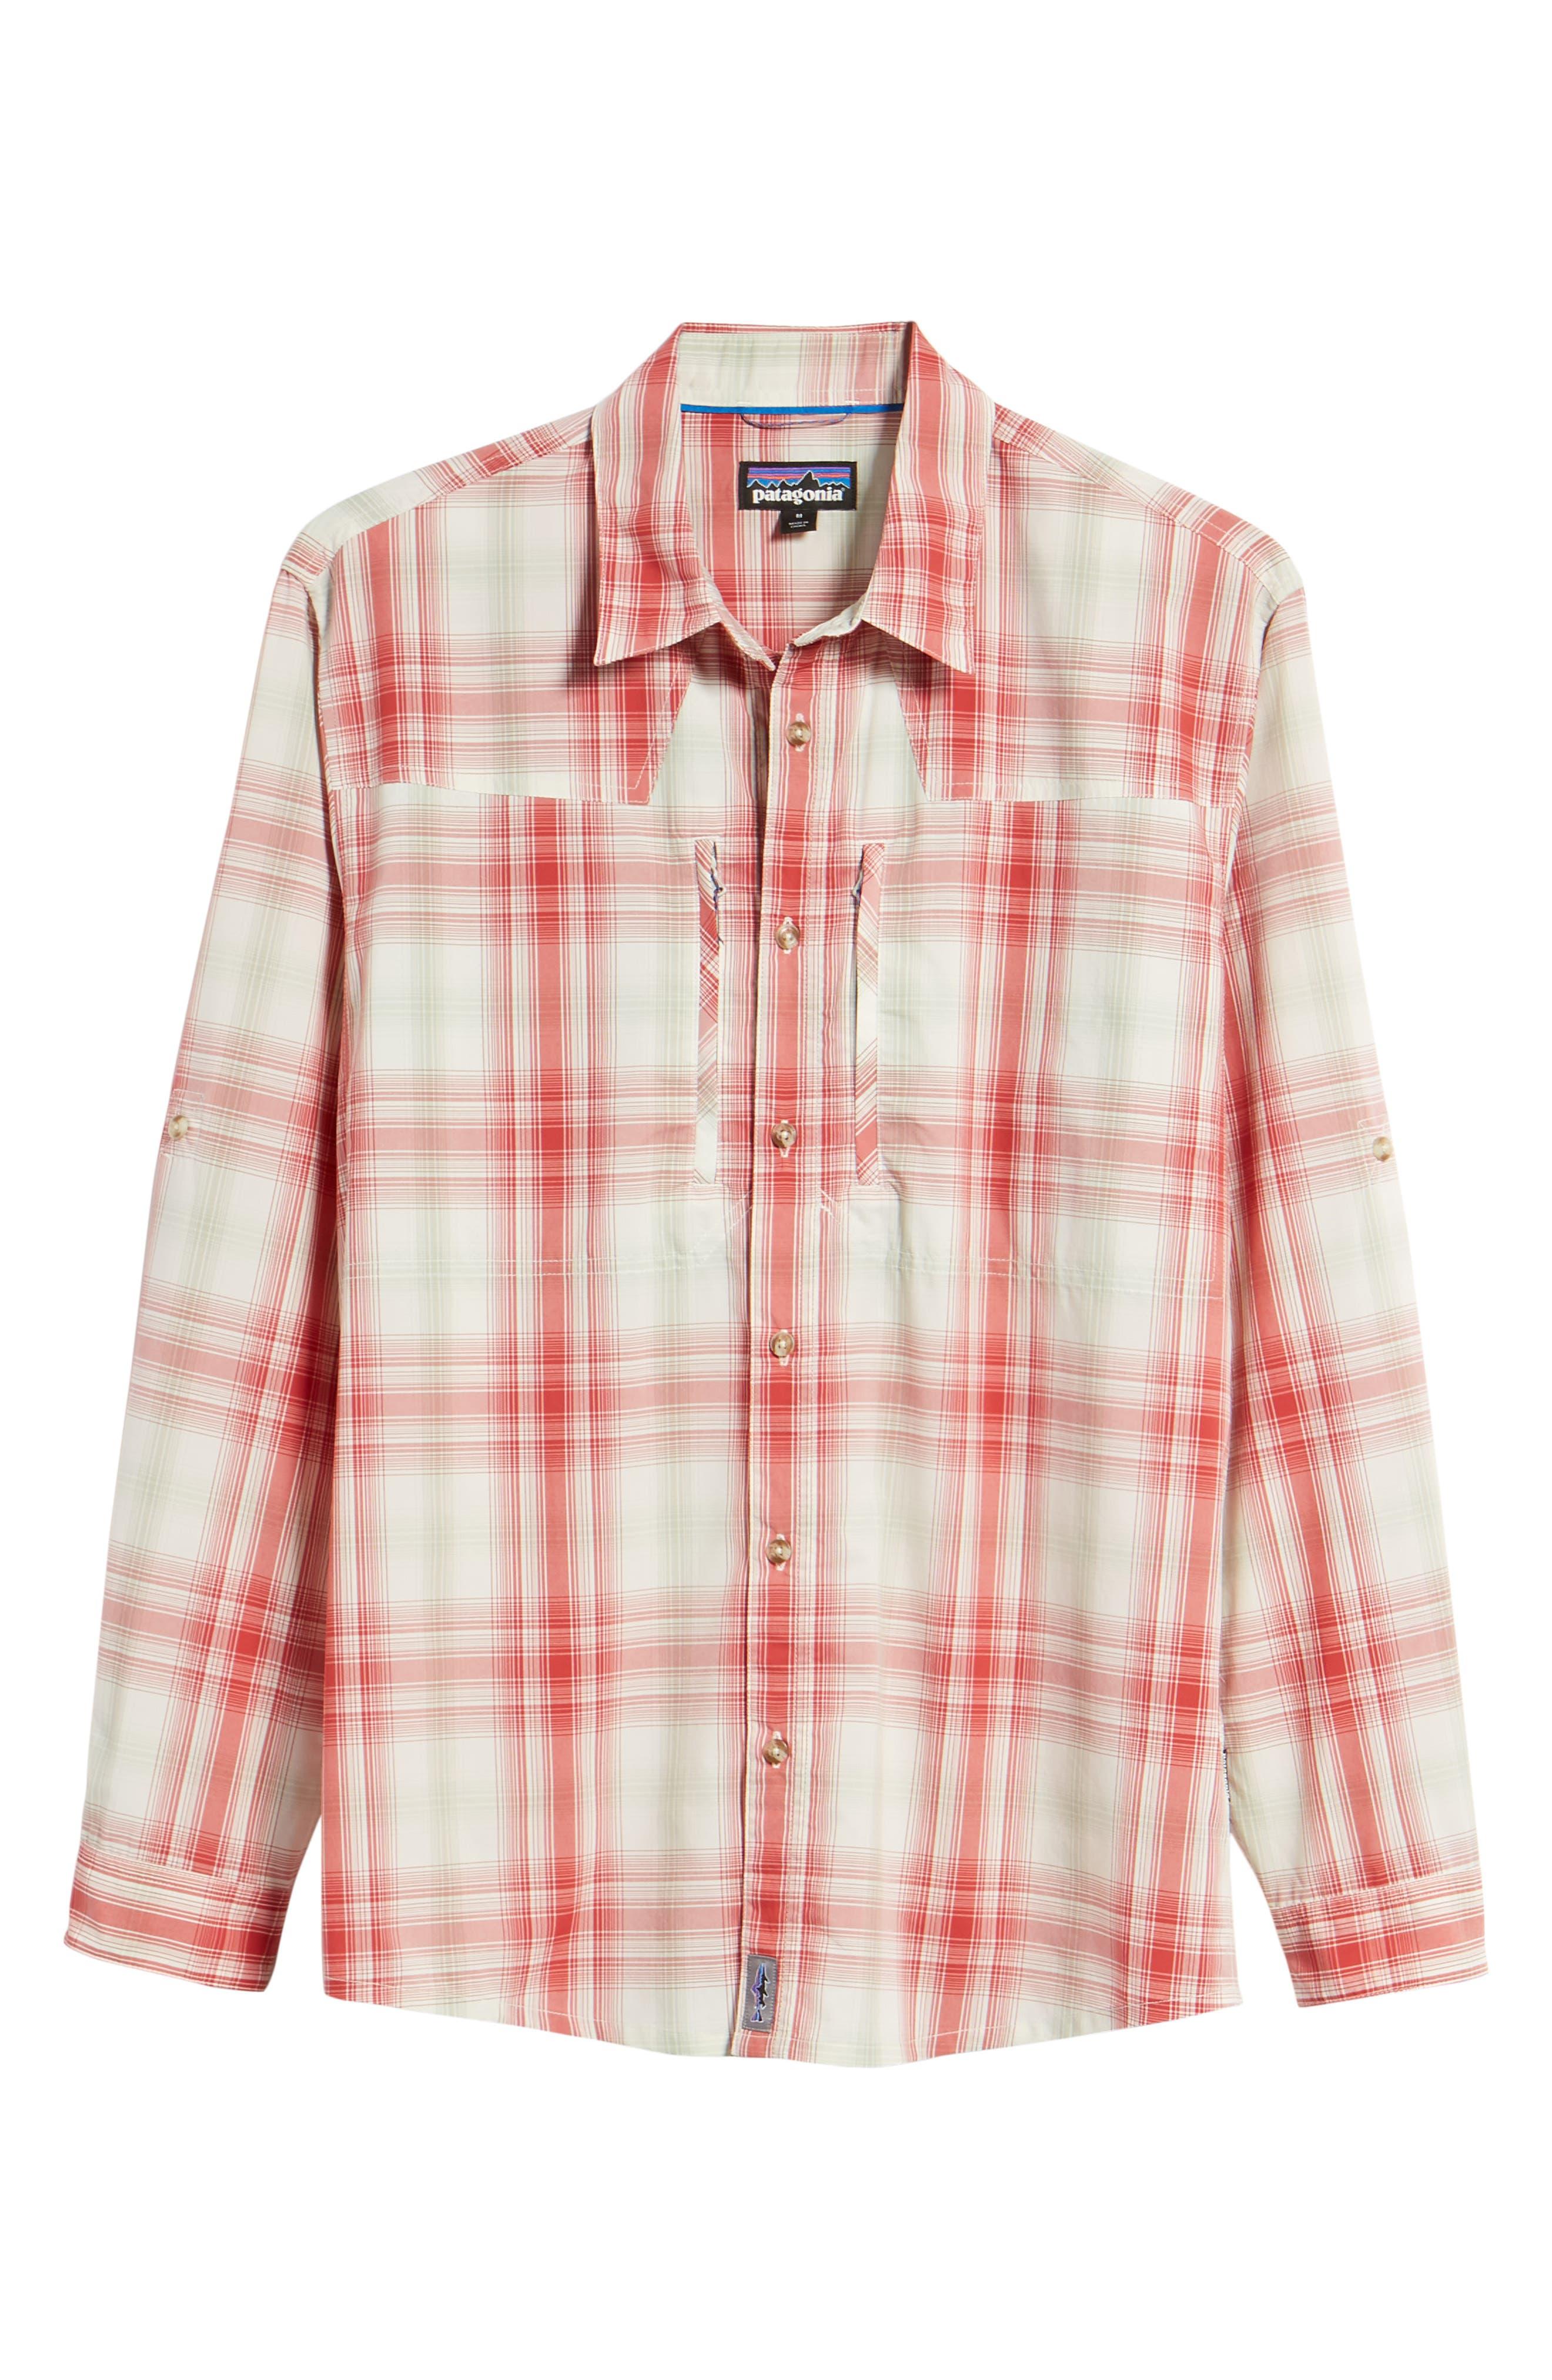 Regular Fit Plaid Sport Shirt,                             Alternate thumbnail 6, color,                             King Swing/ Static Red